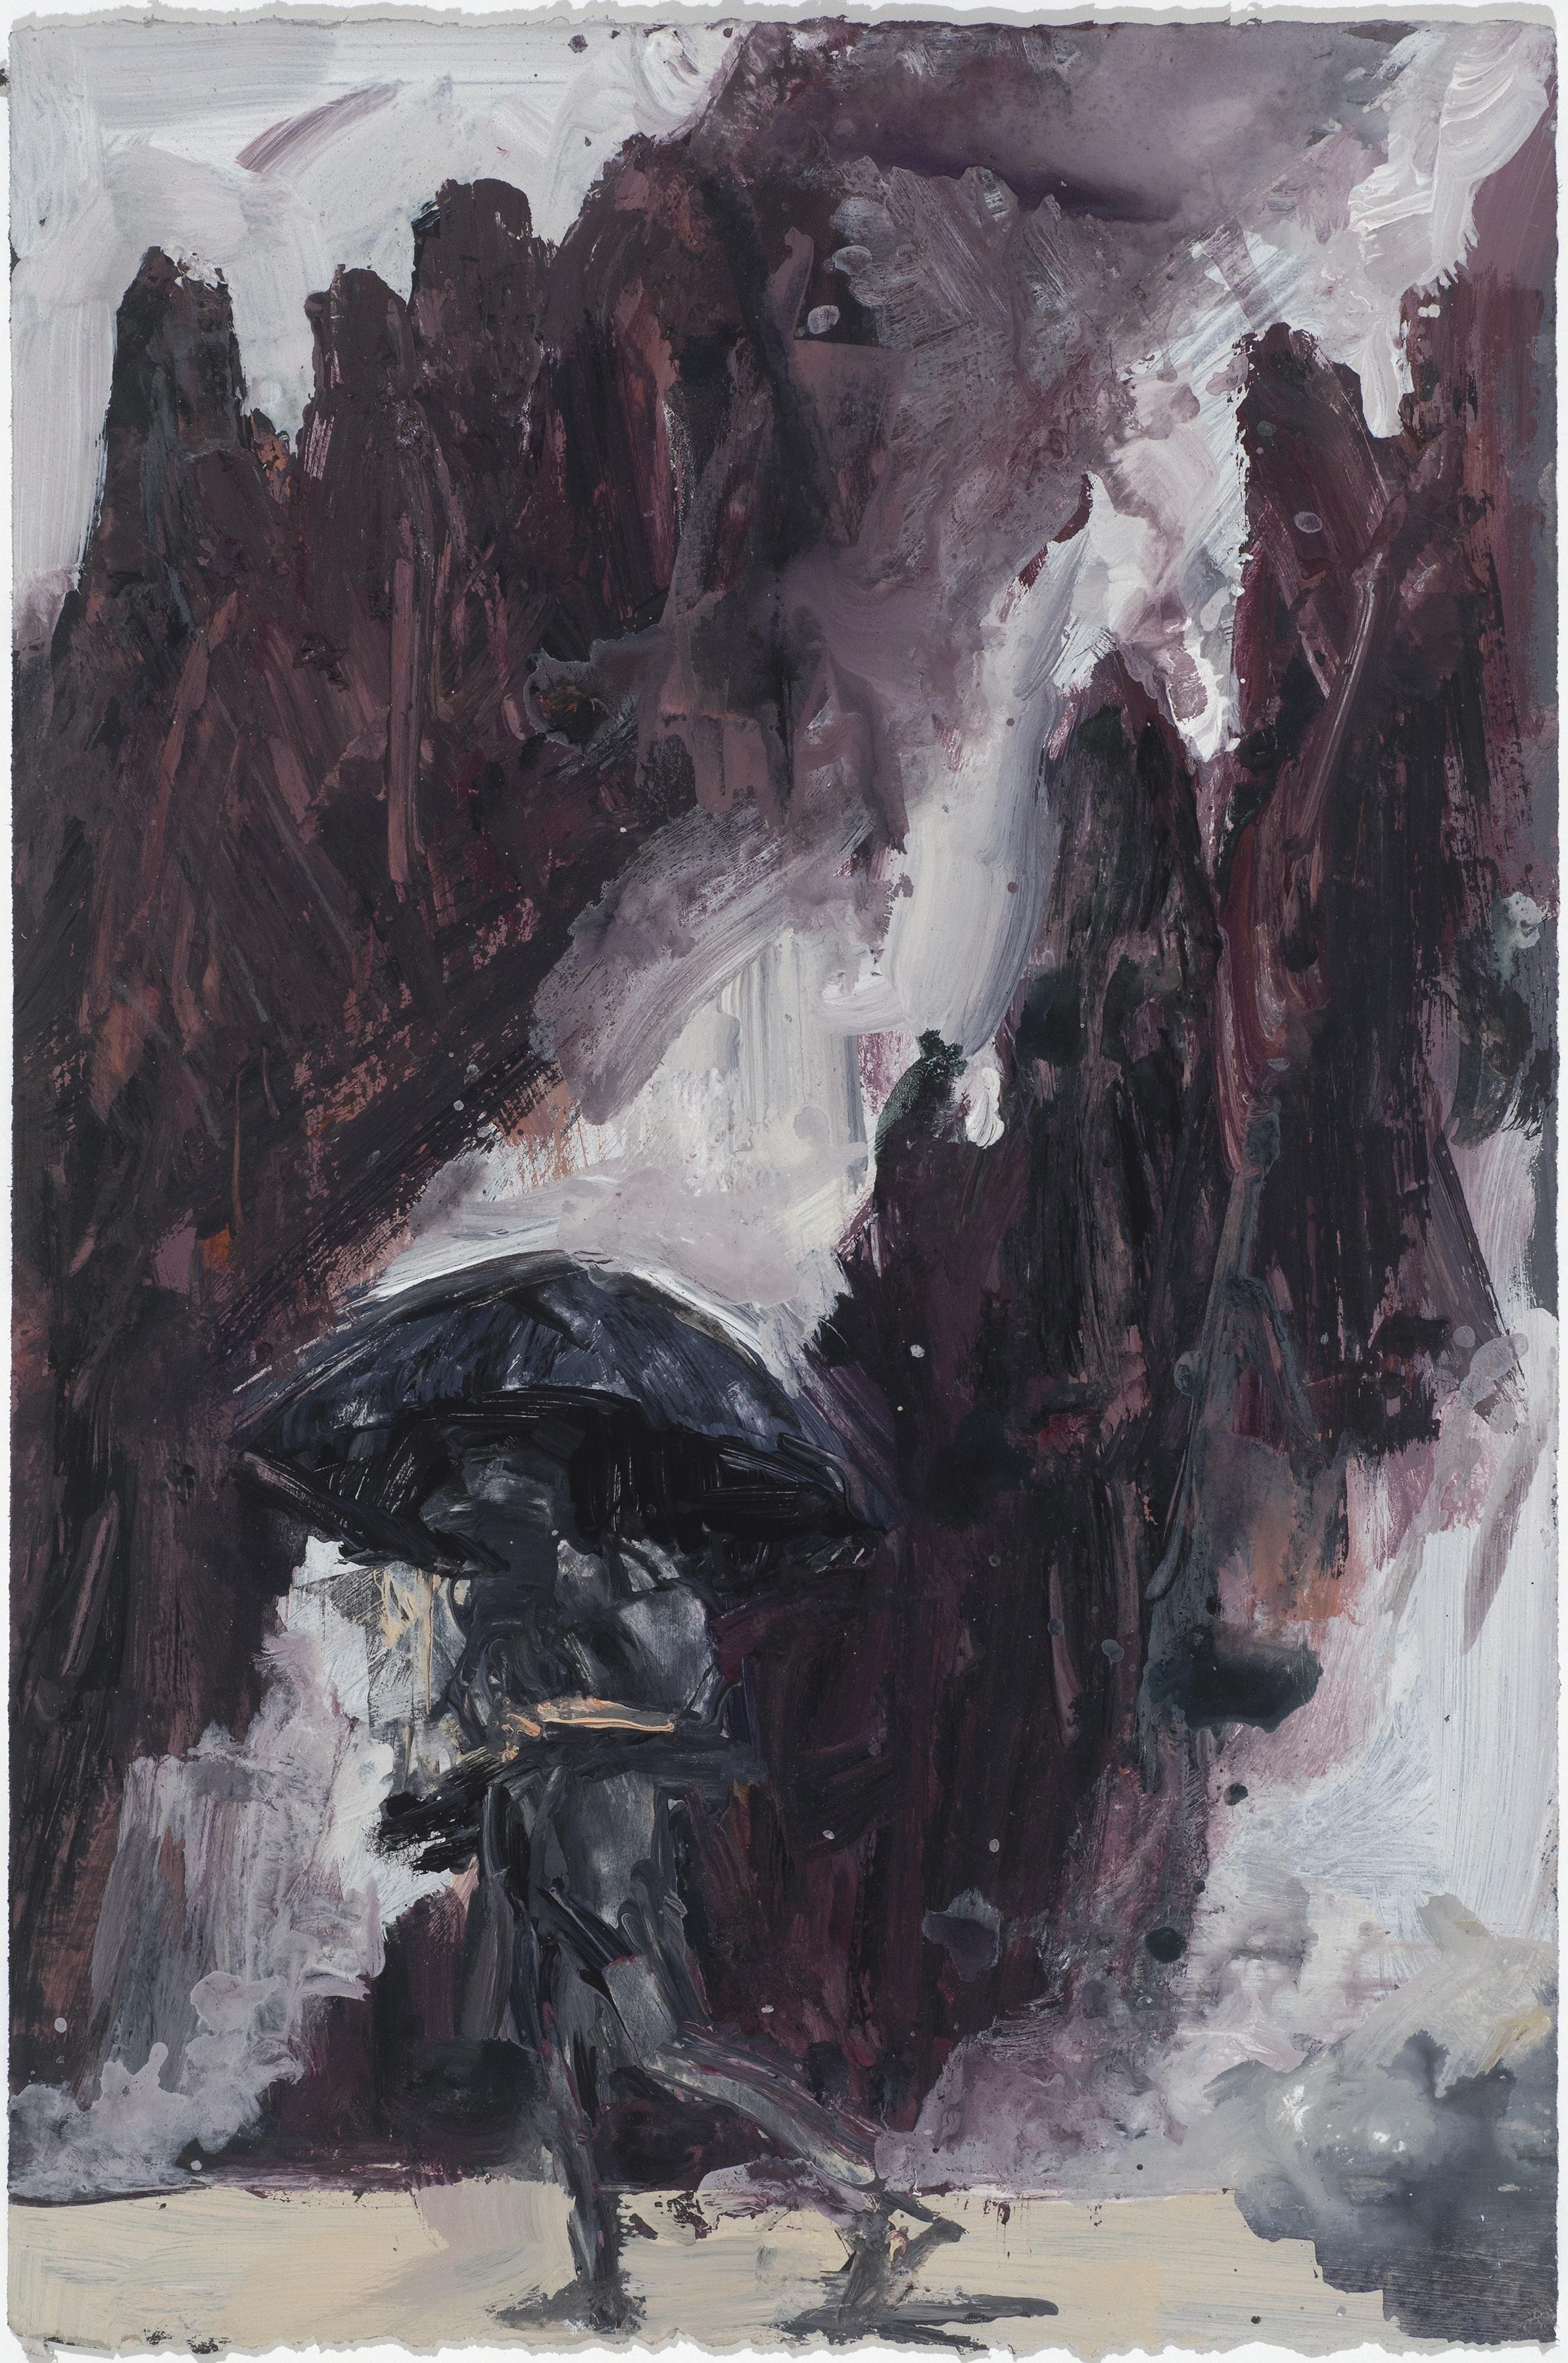 Umbrella & mist study